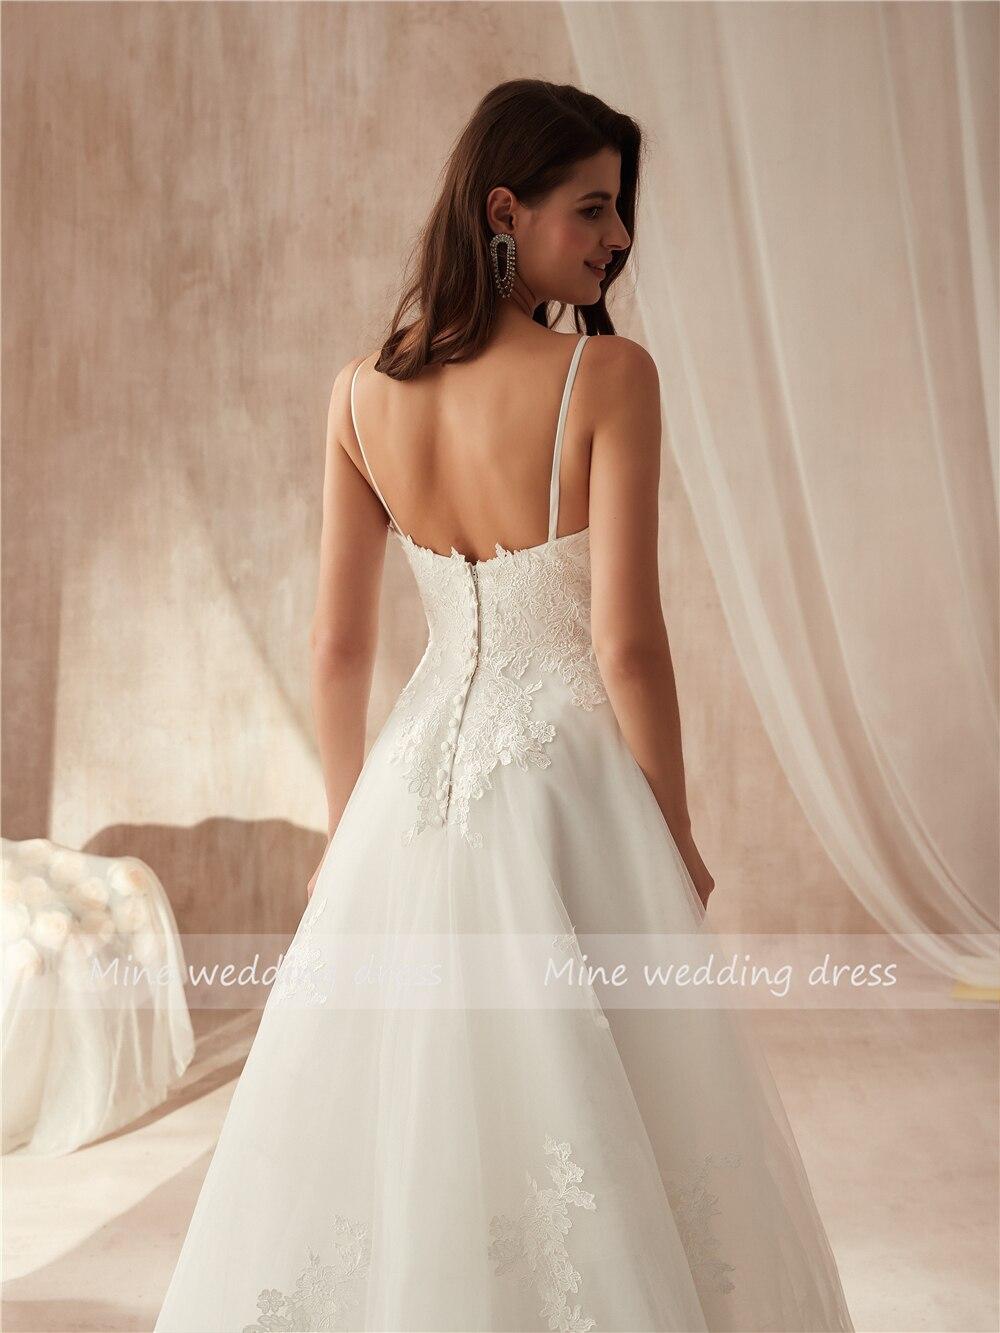 Image 5 - Spaghetti Straps Applique Lace A line Wedding Dress vestido de festa longo de luxo Bridal Gowns New Fashinon 2019 New-in Wedding Dresses from Weddings & Events